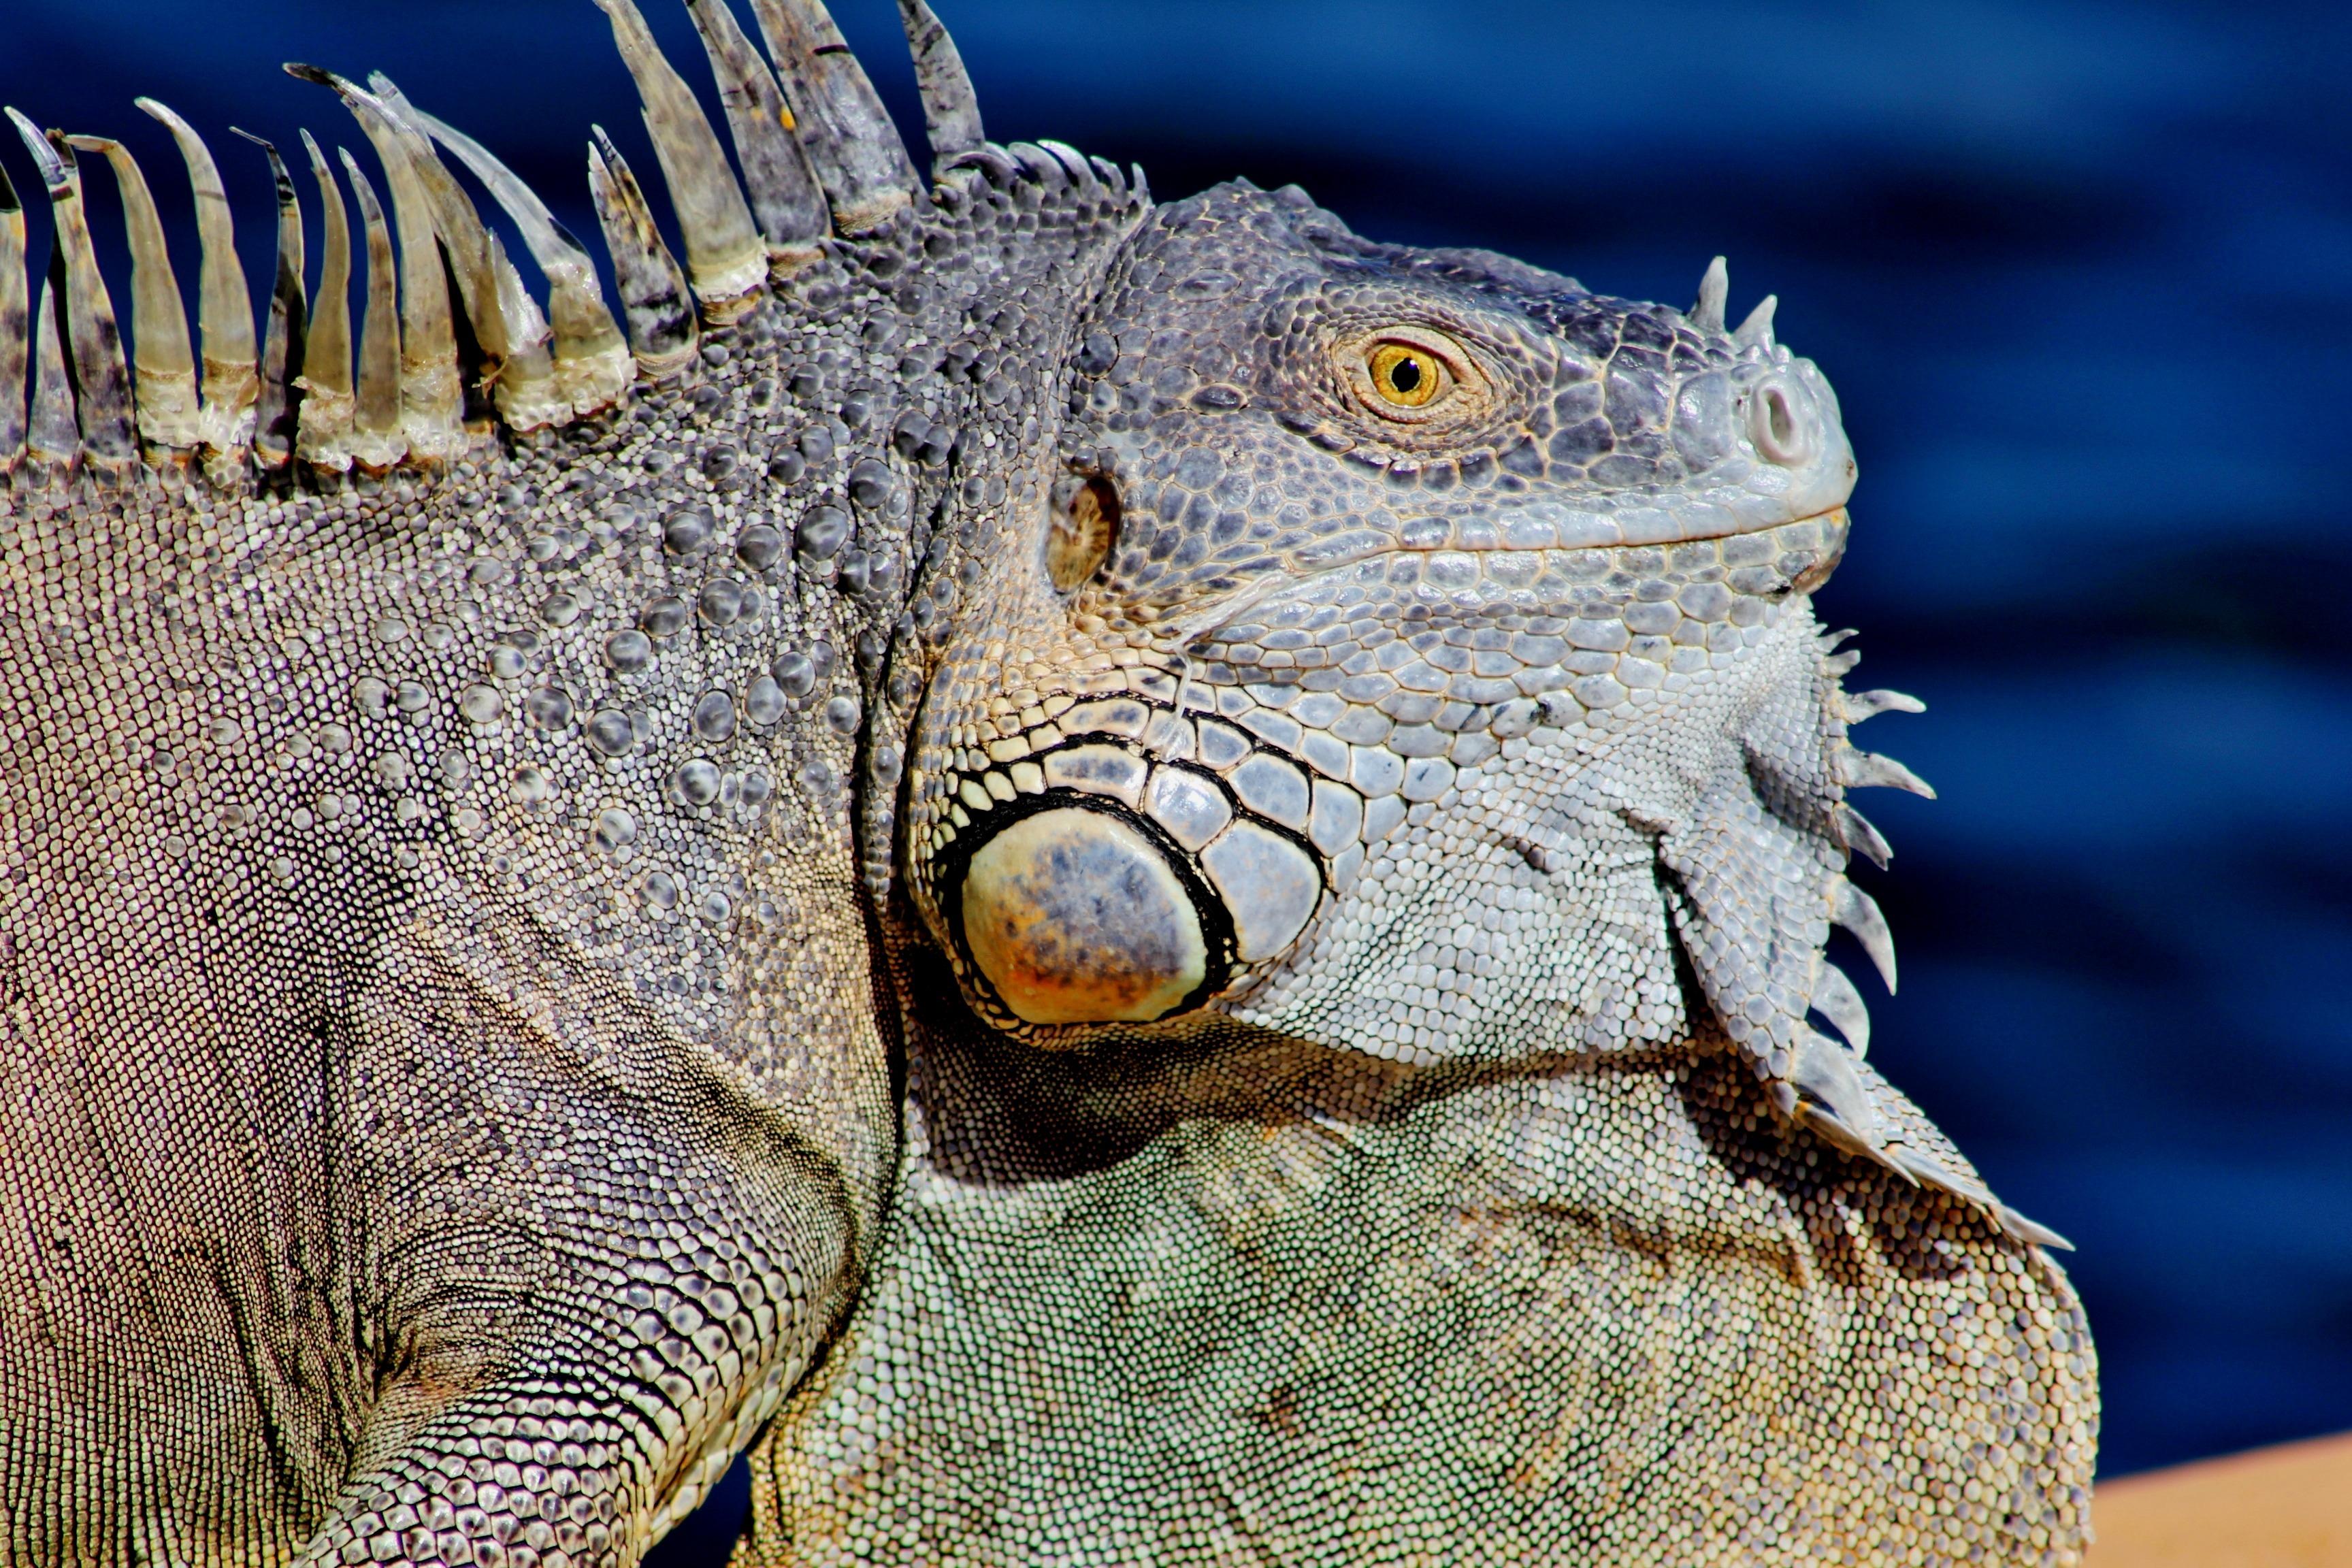 Wild Iguana, Animal, Iguana, Lizard, Nature, HQ Photo